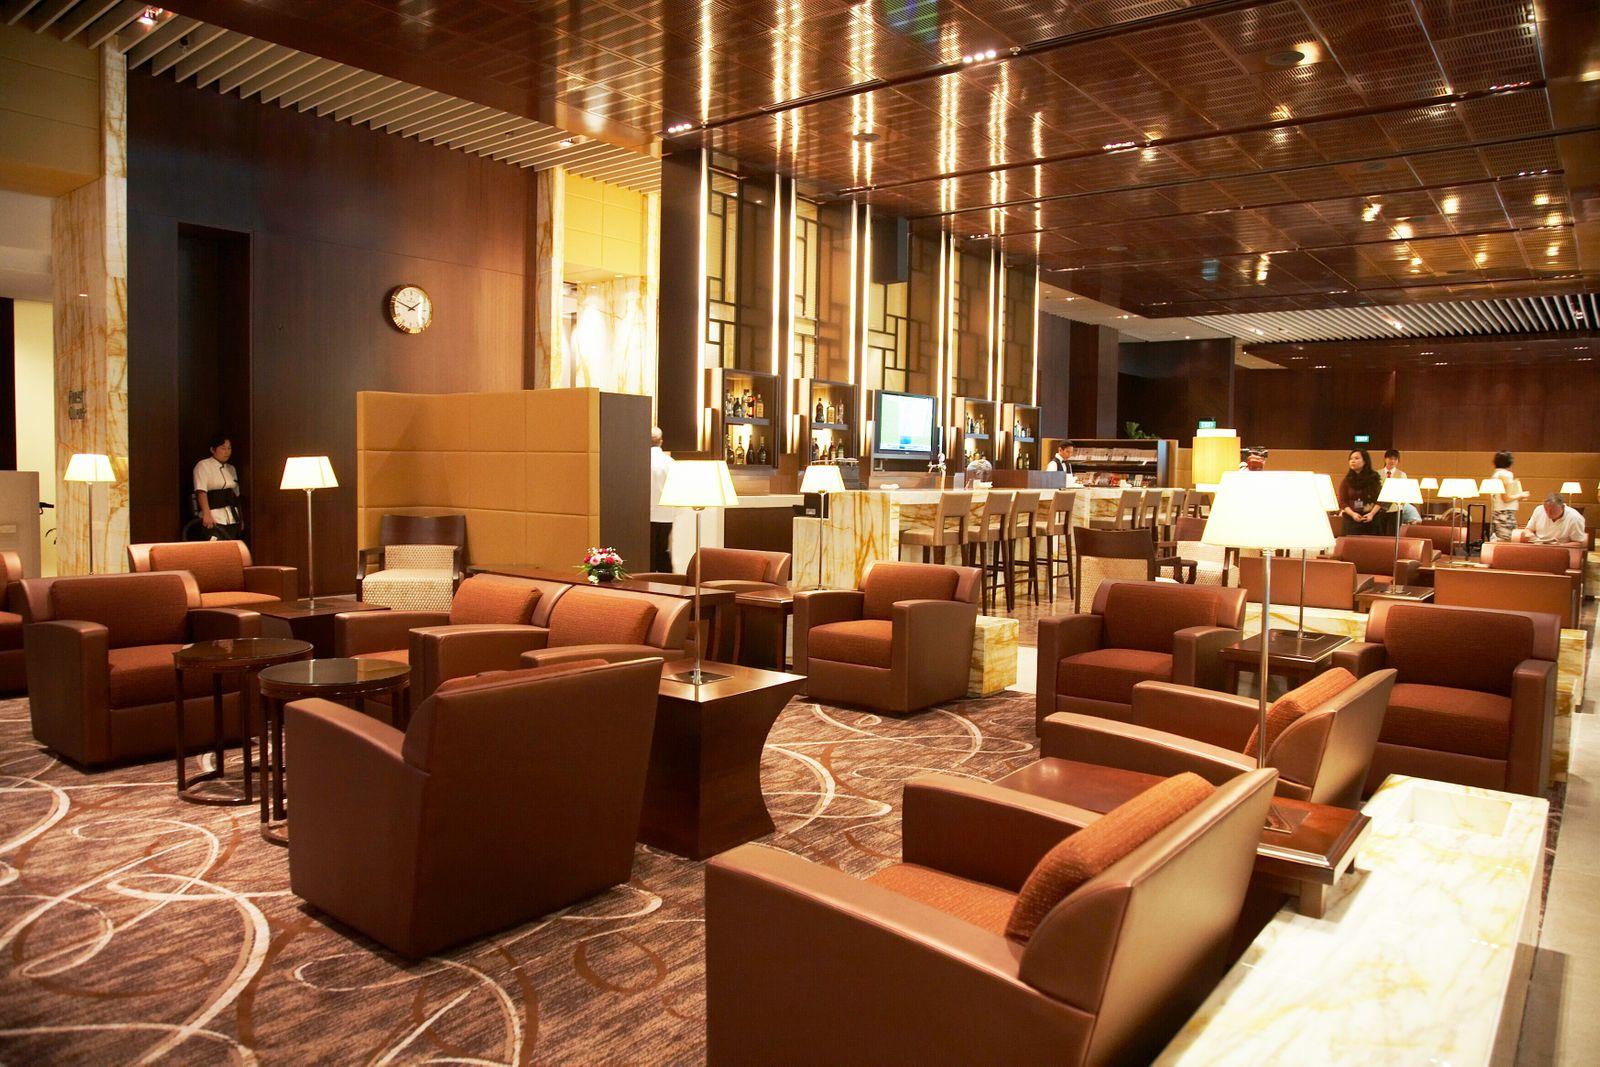 Singapore Airlines / Silverkris-Lounge